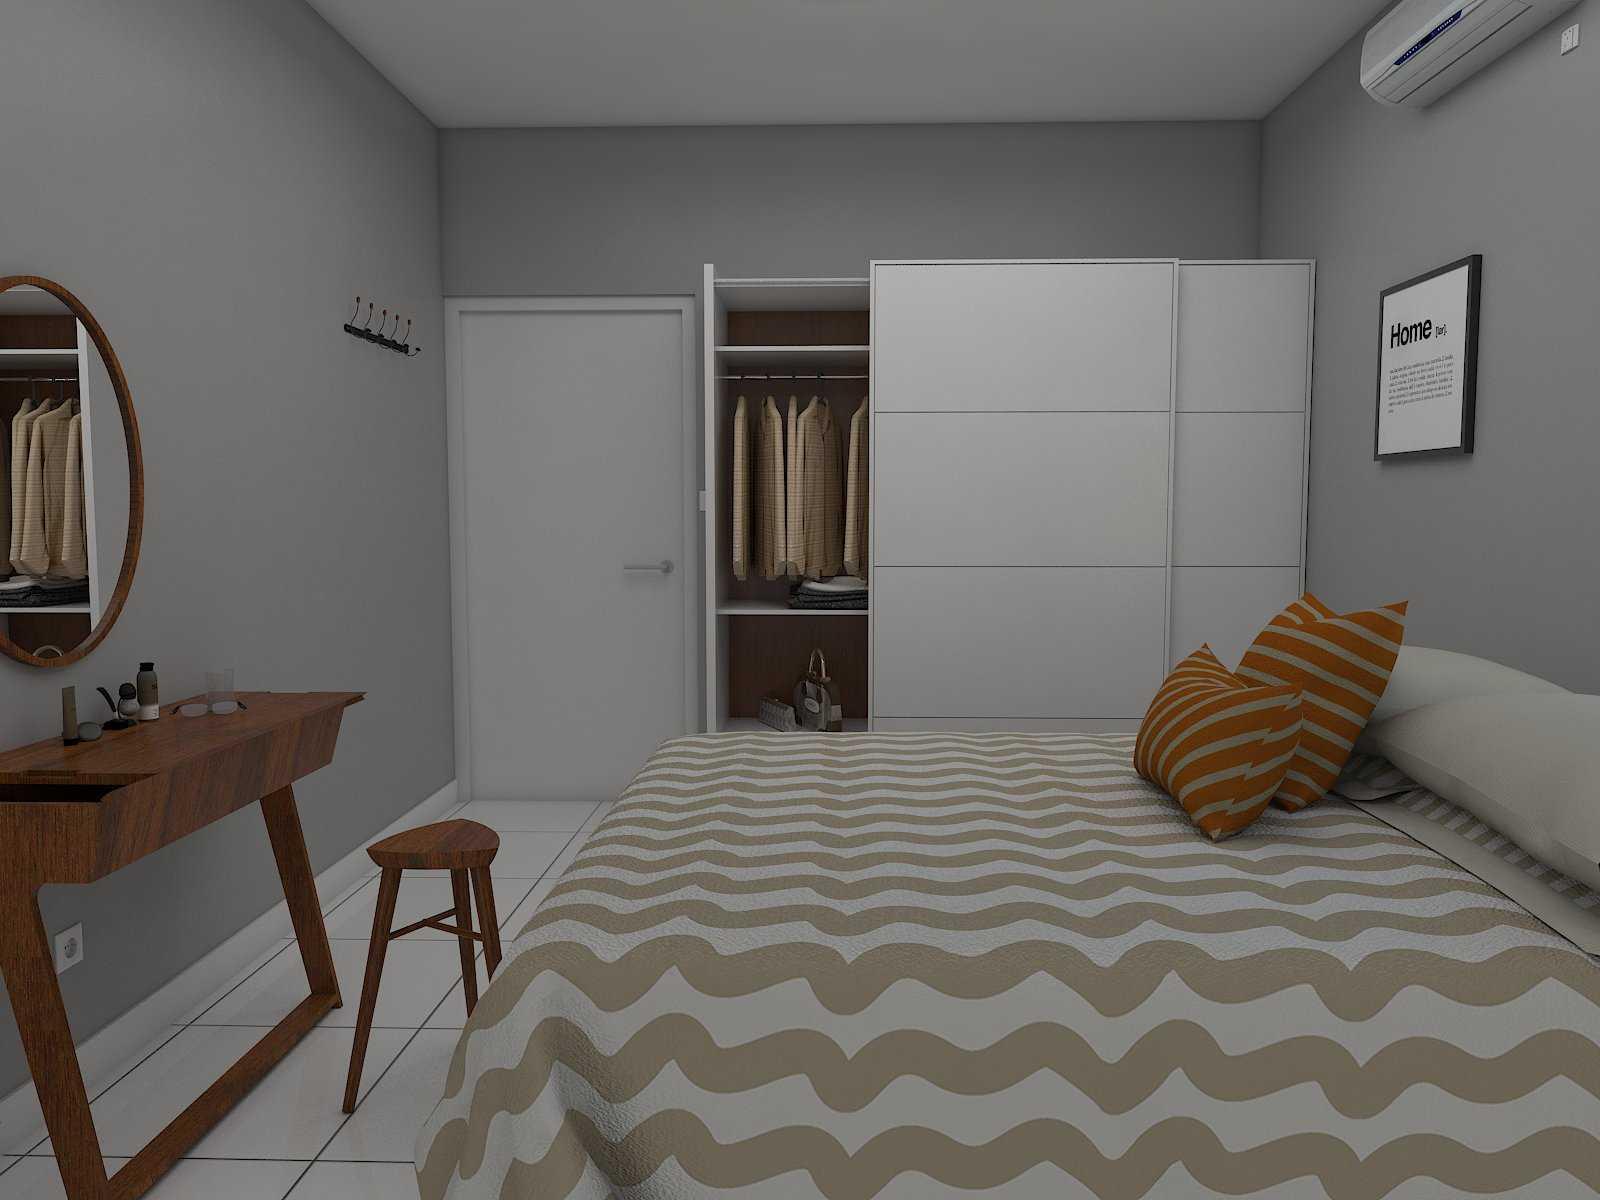 Donnie Marcellino Mr.f's House  Gg. Buntu 2, Jatimelati, Pondokmelati, Kota Bks, Jawa Barat 17415, Indonesia Guest Bedroom Design Kontemporer  30166